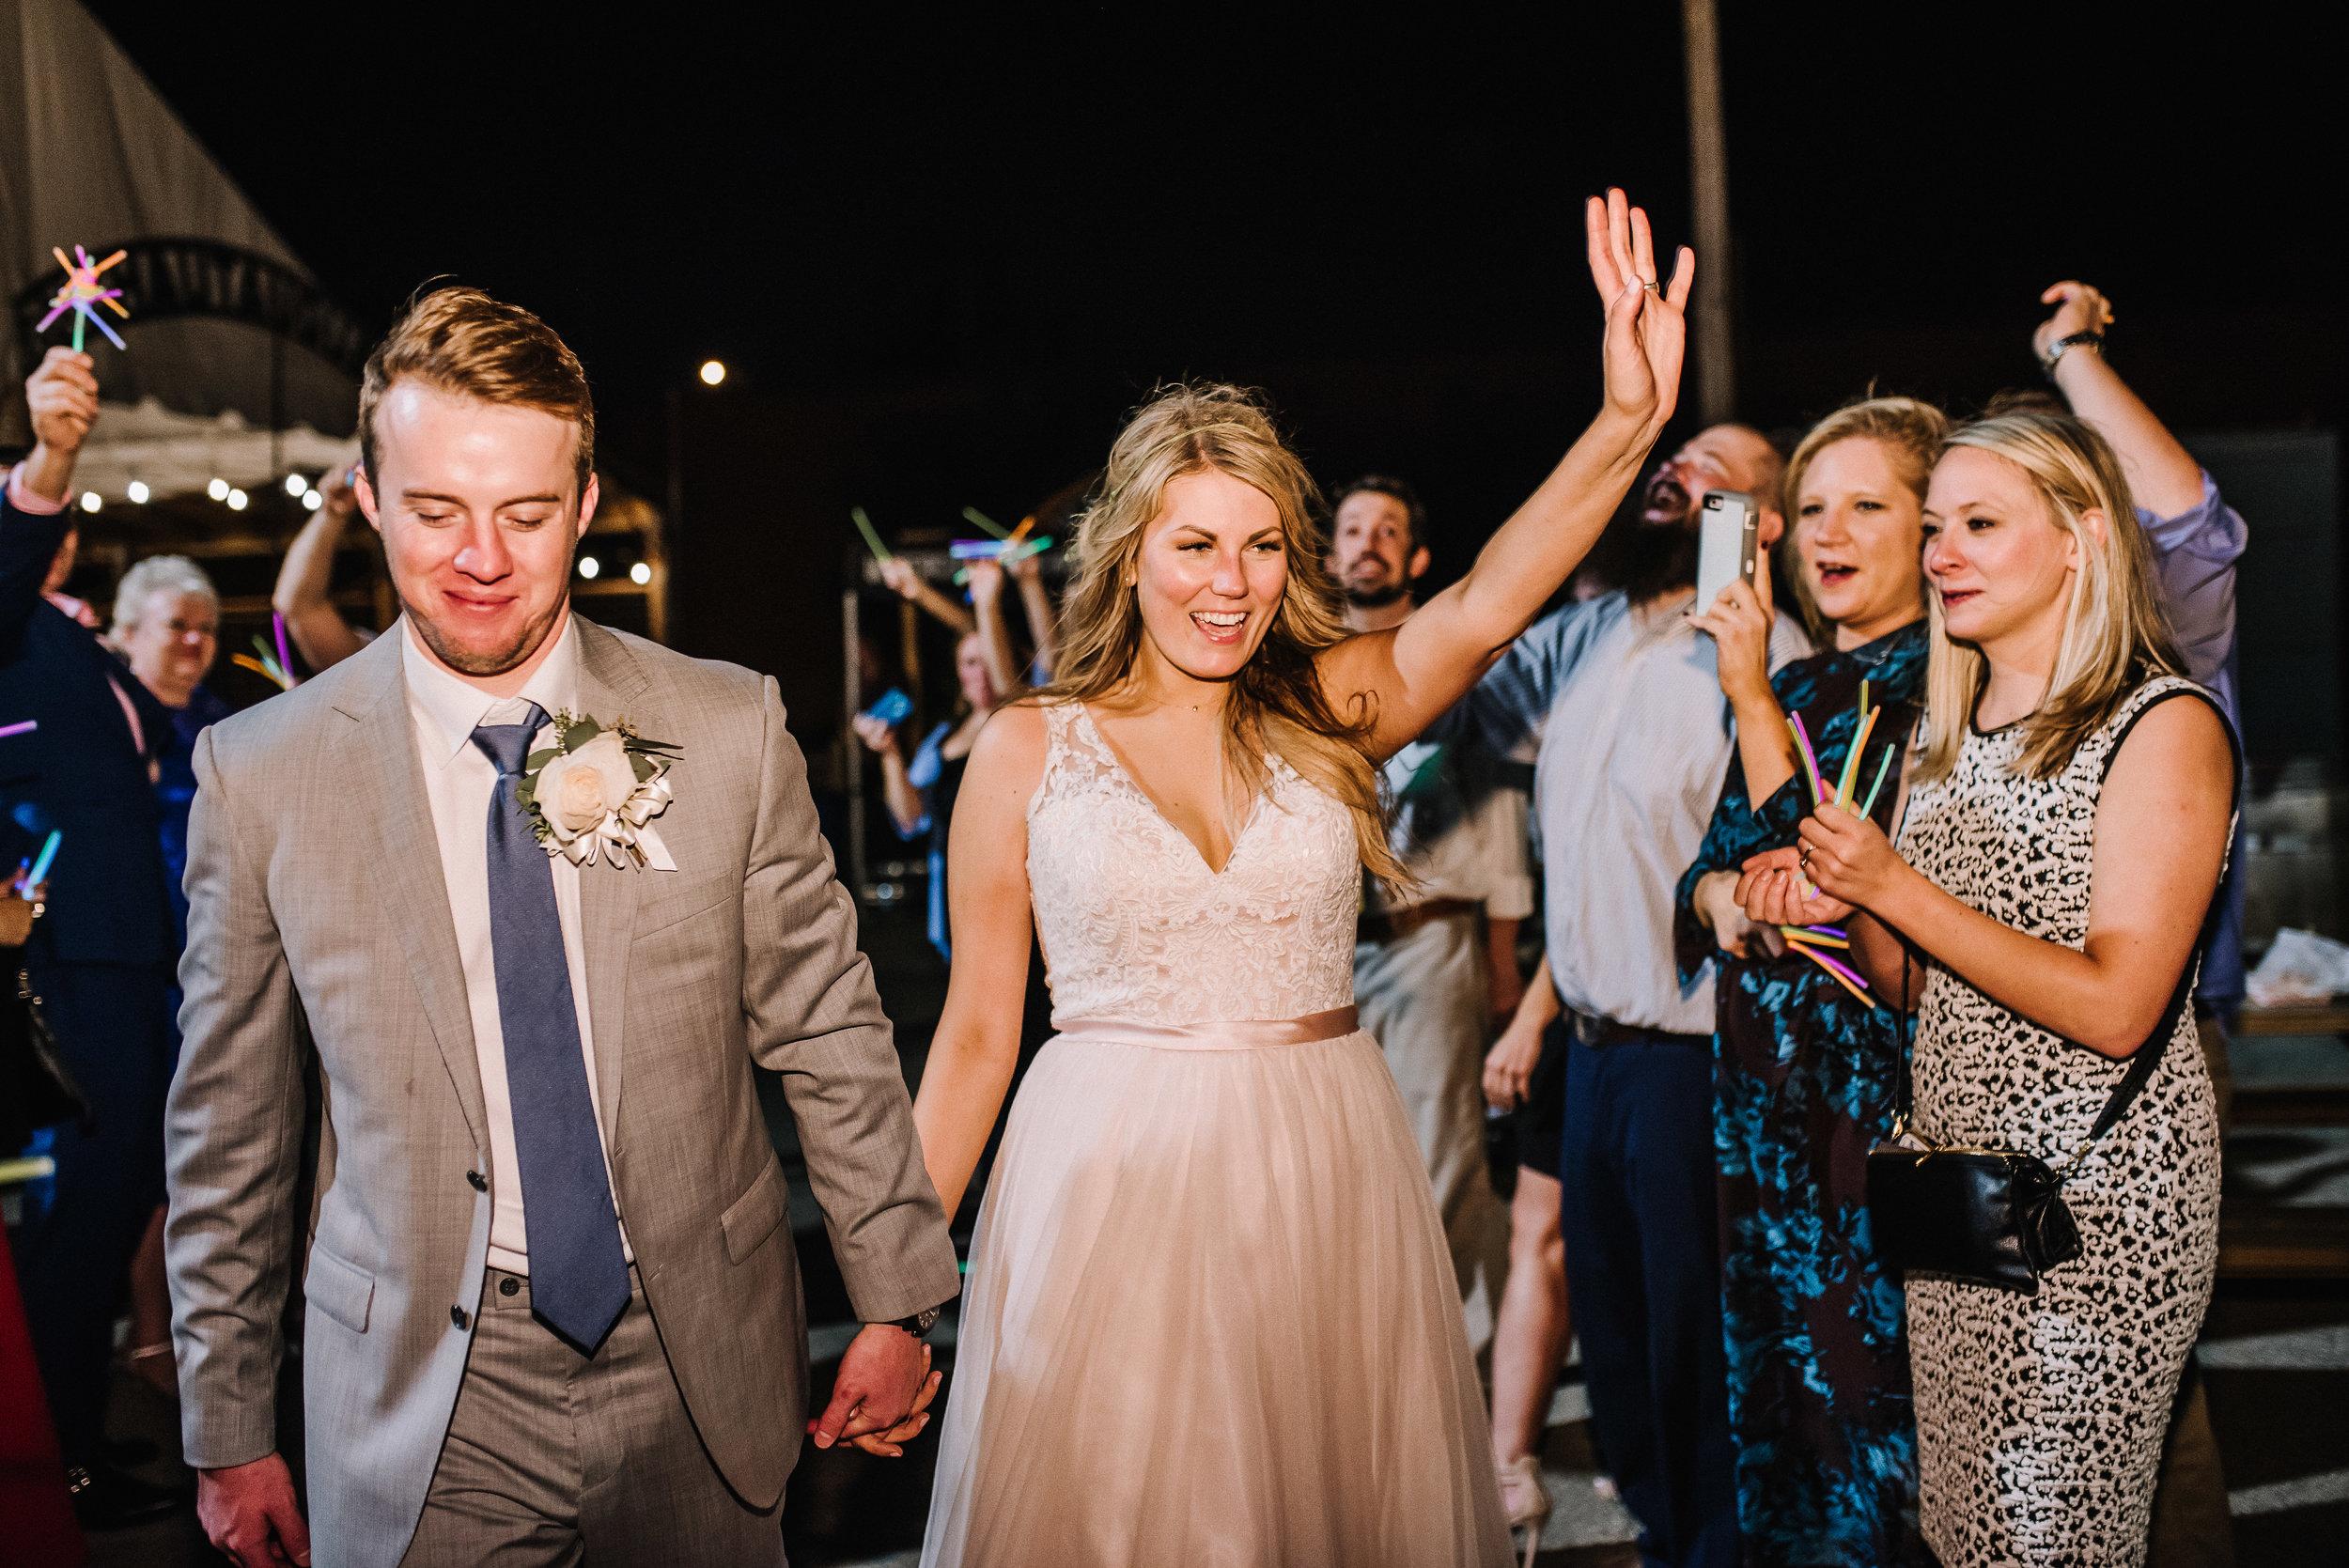 Pearson-Wiseacre-Wedding_Ashley-Benham-Photography (633 of 633).jpg